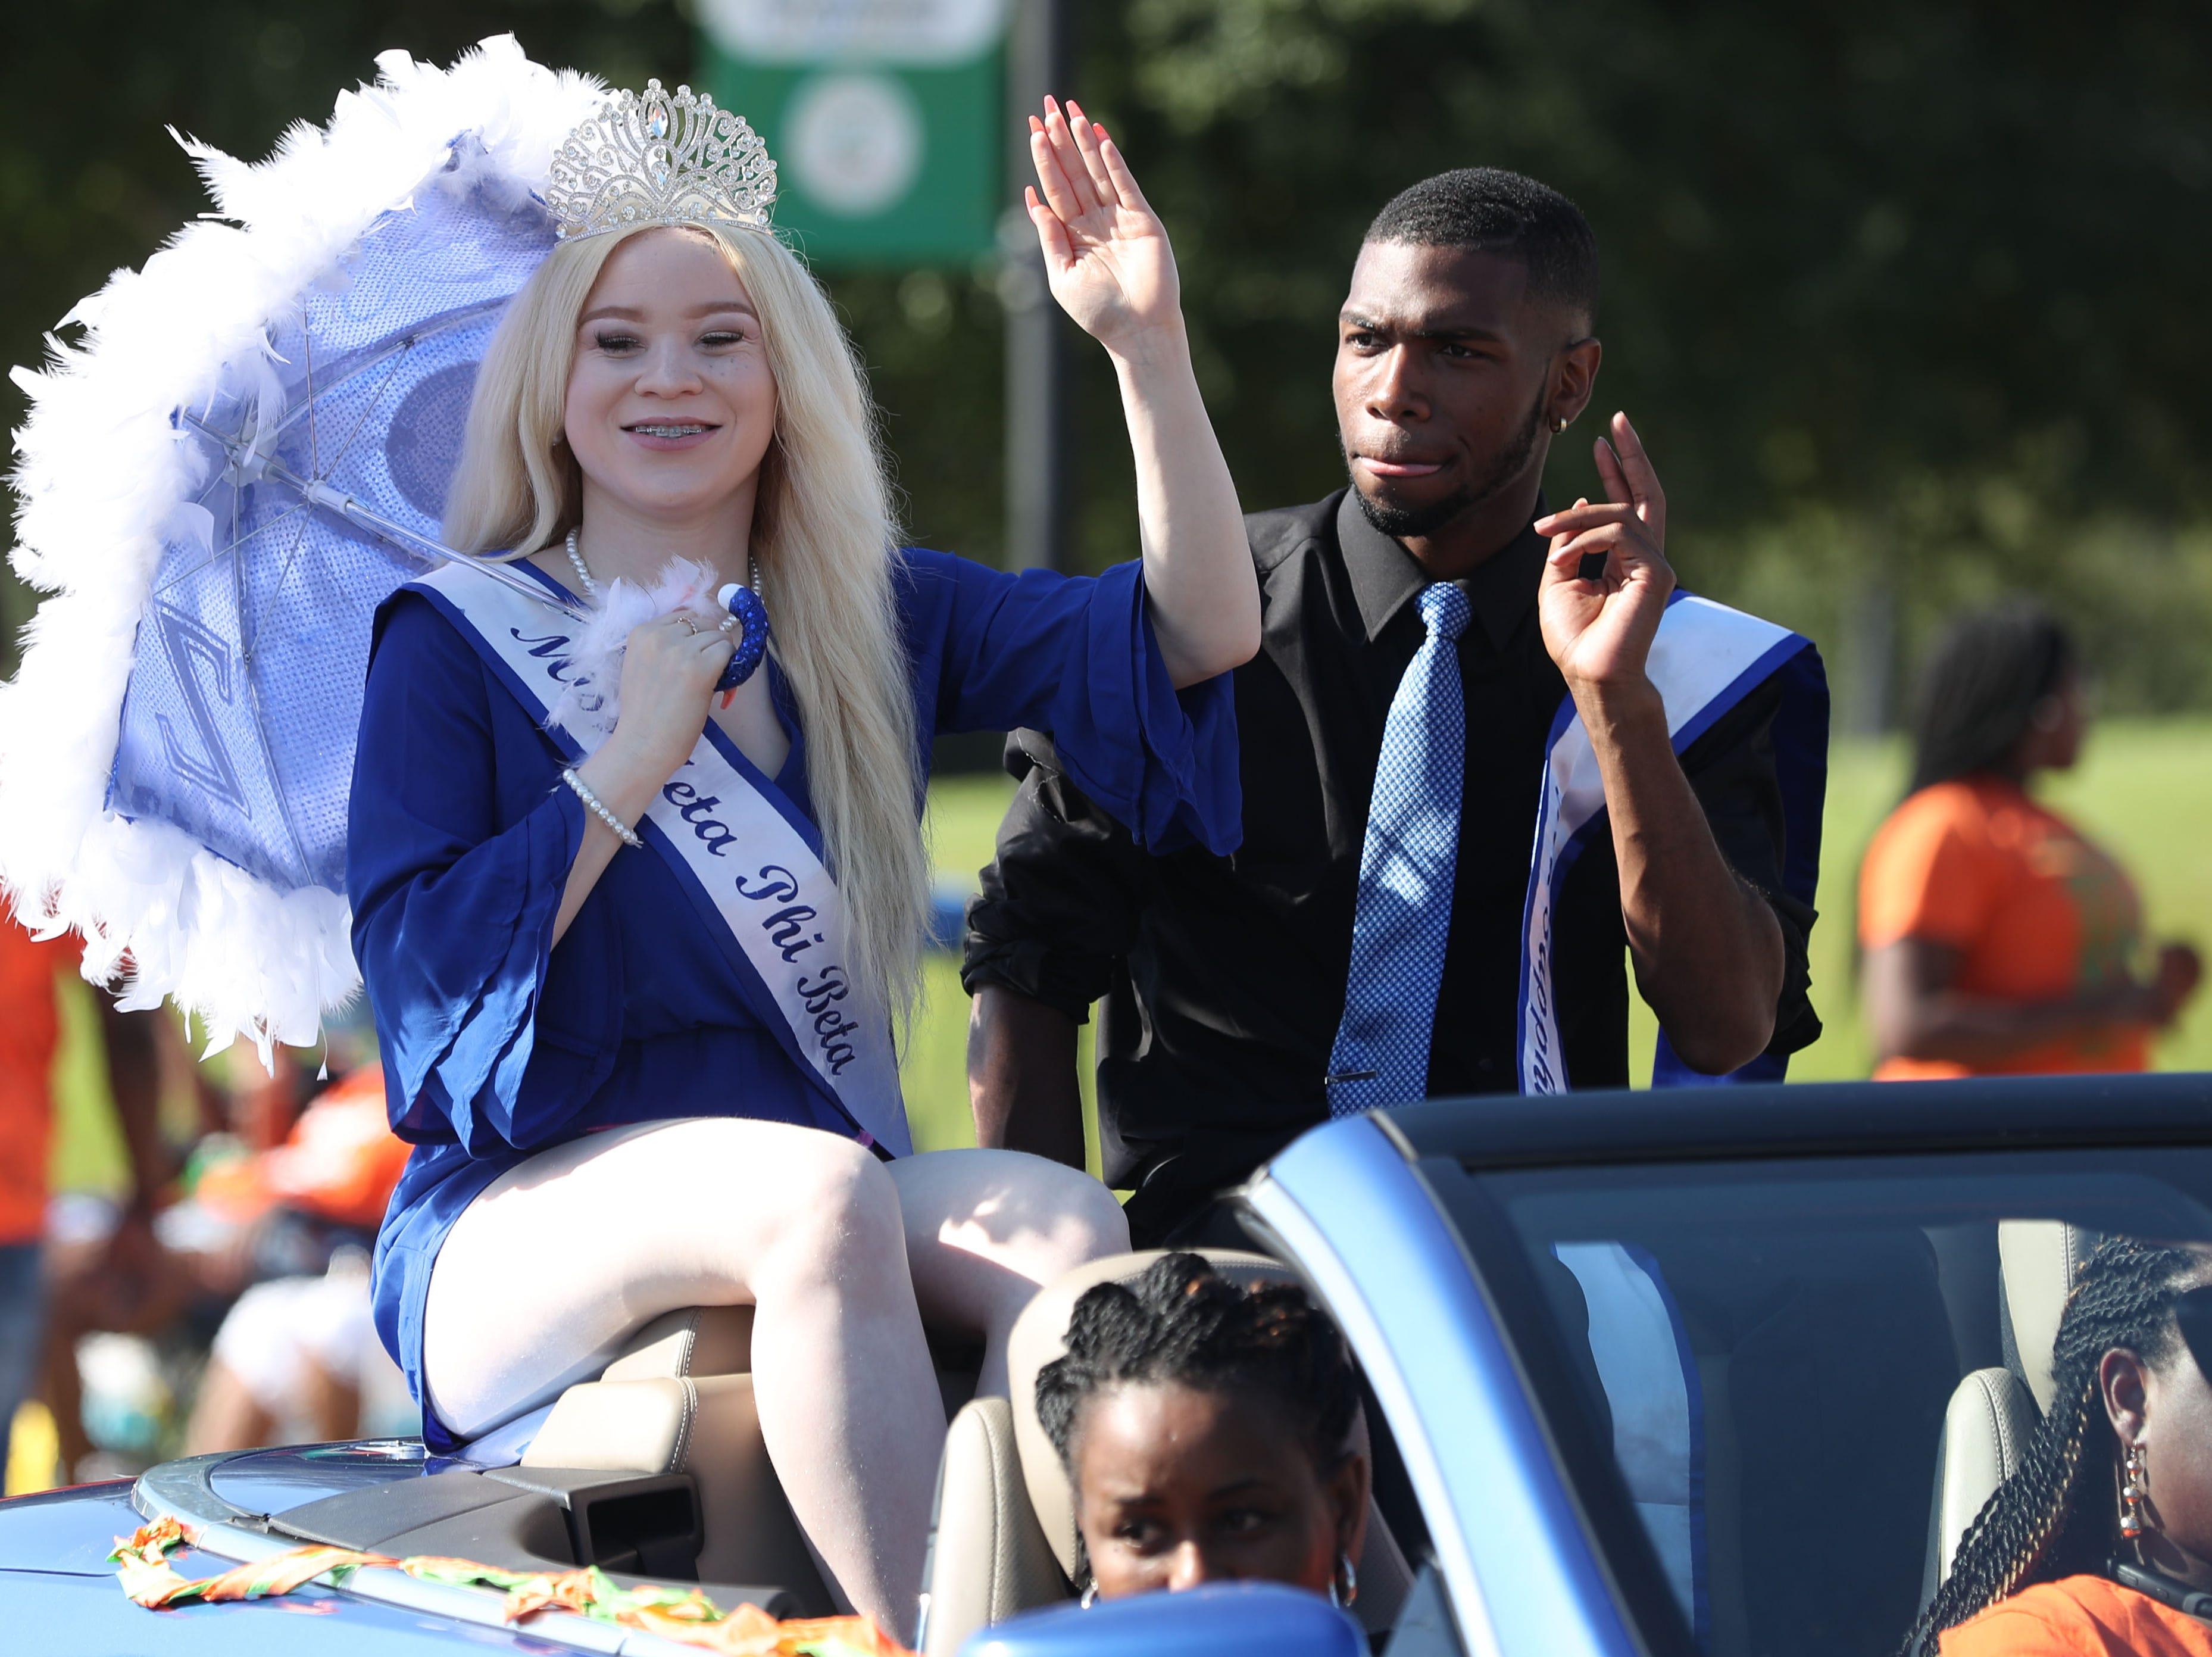 Florida A&M hosts a homecoming parade Saturday, Oct. 6, 2018.